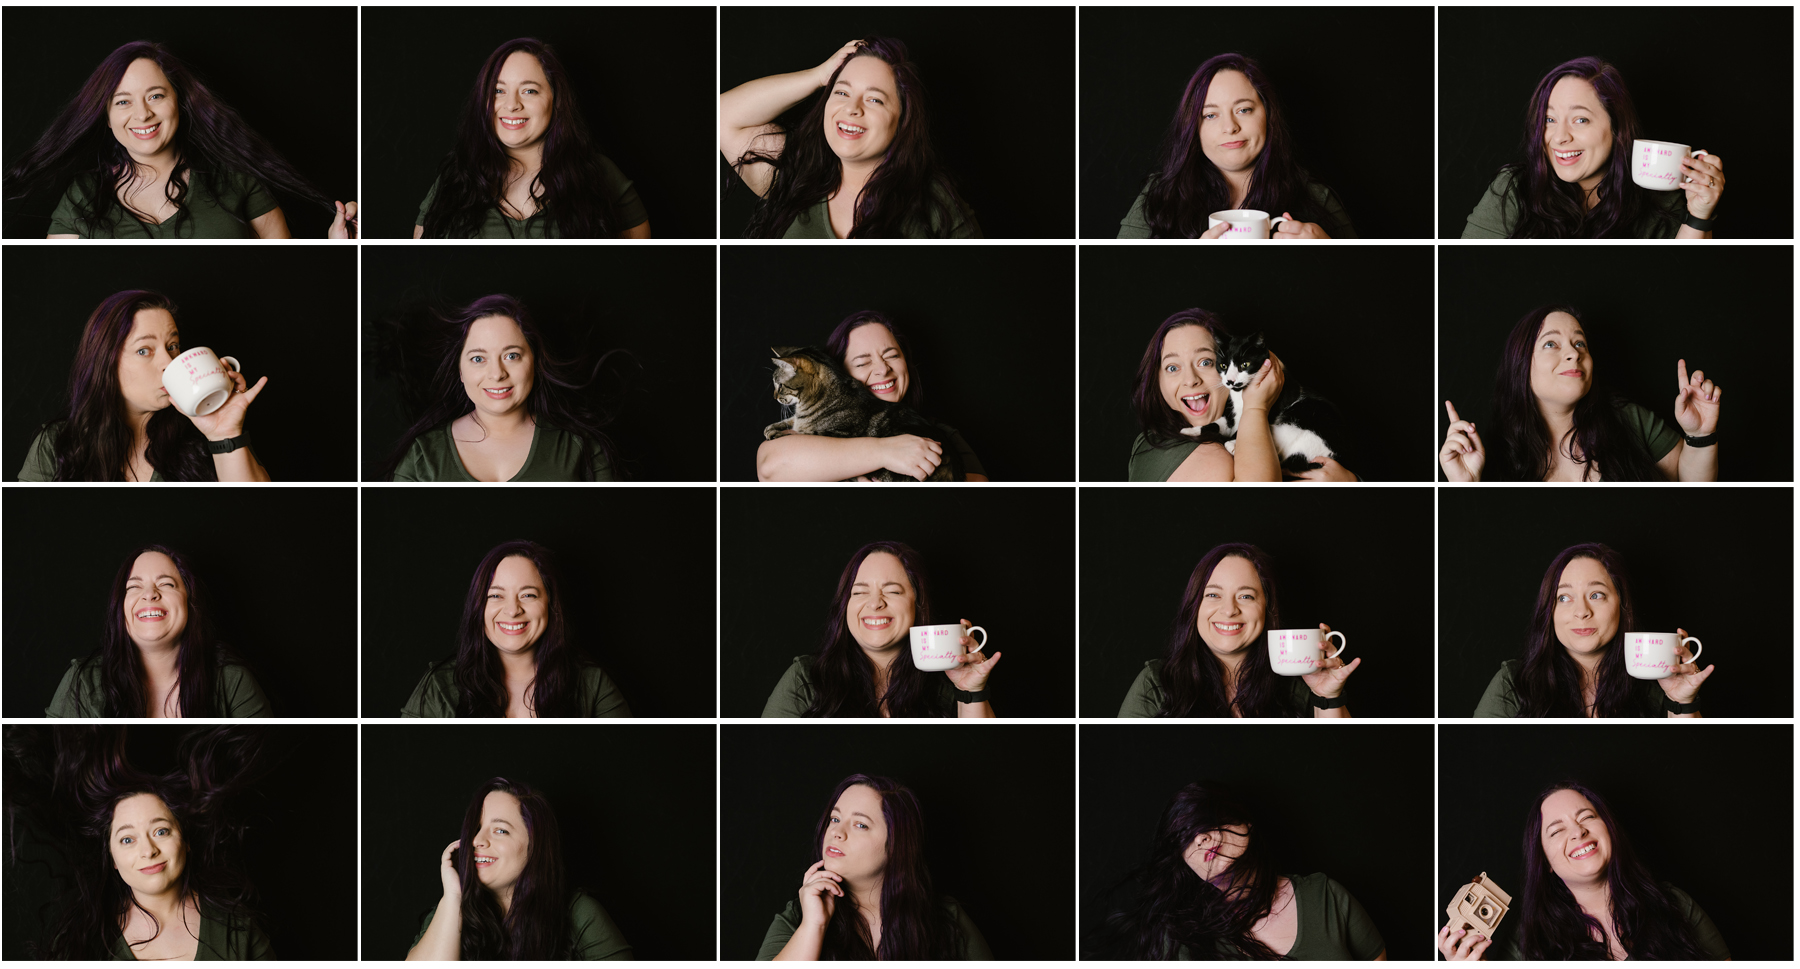 sydney-marie-photography-portraits.jpg